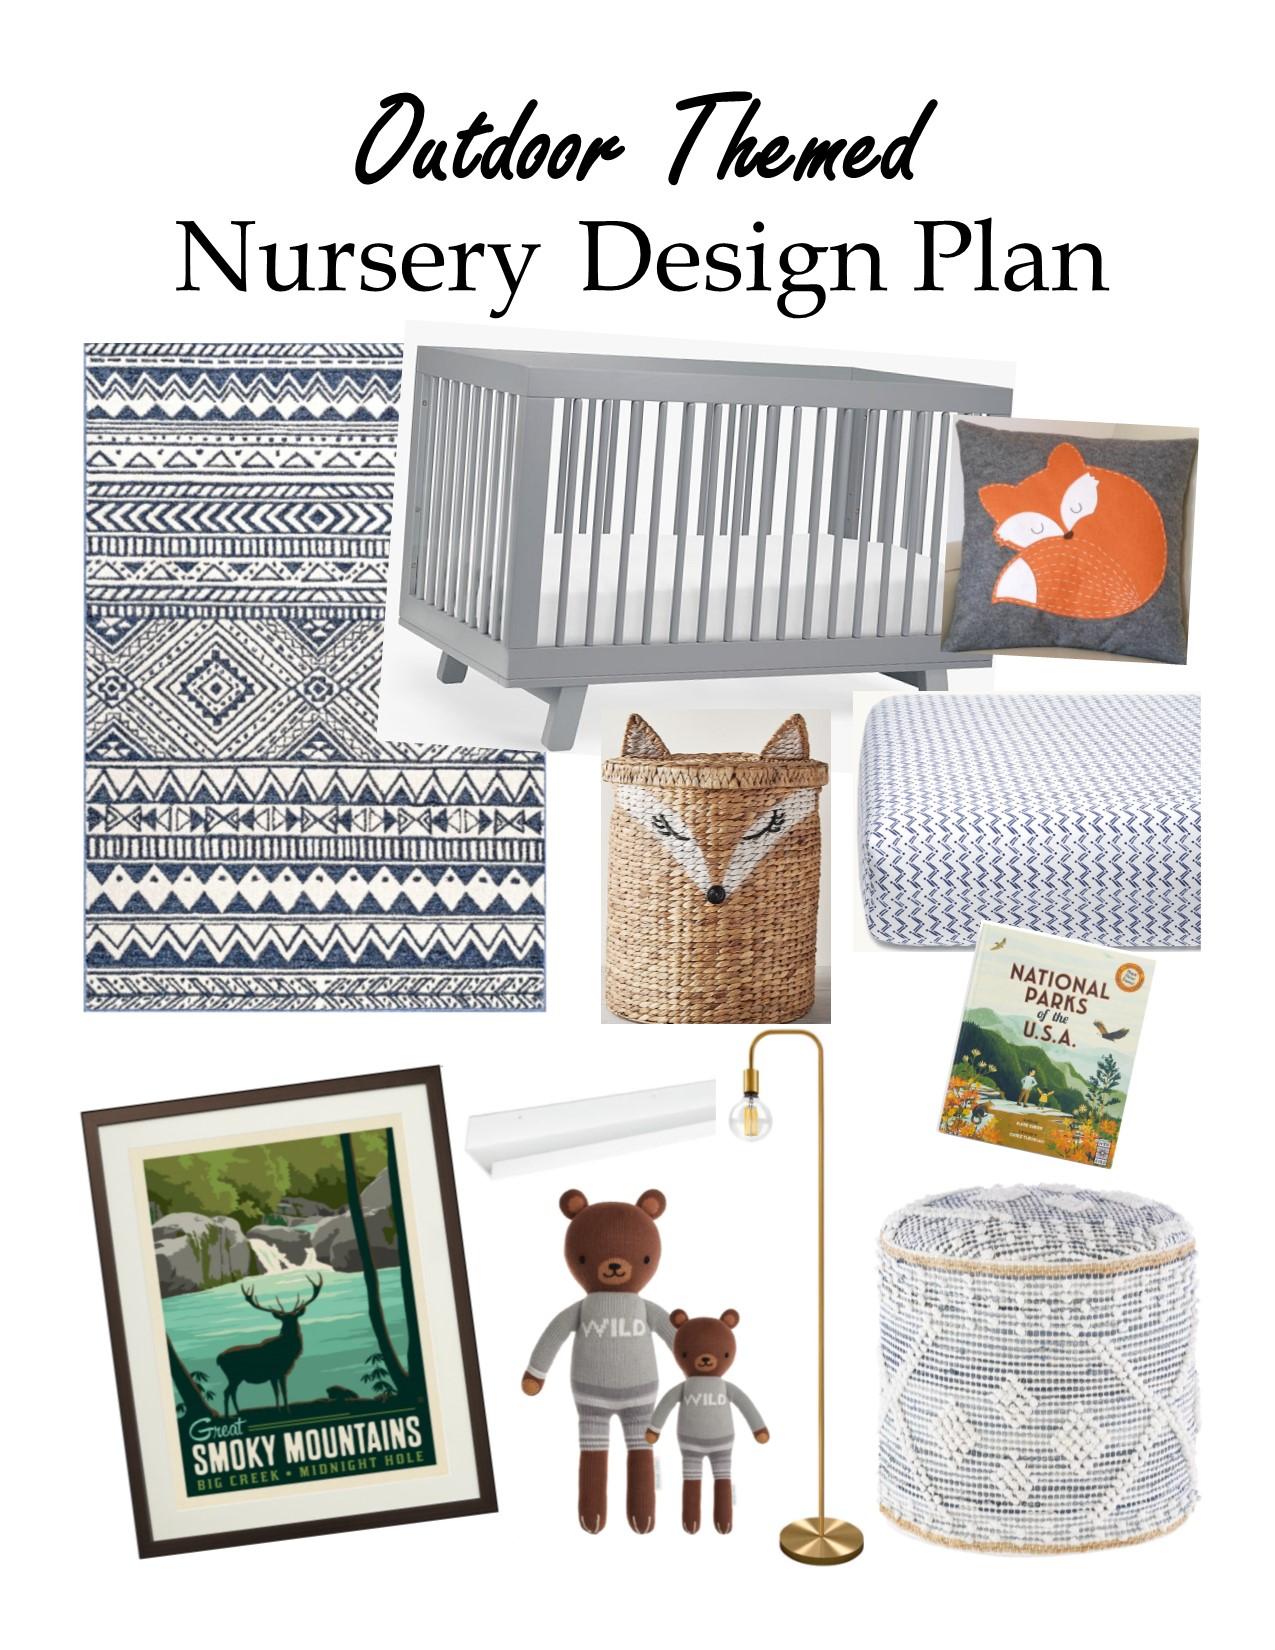 Outdoor Themed Nursery Design Plan